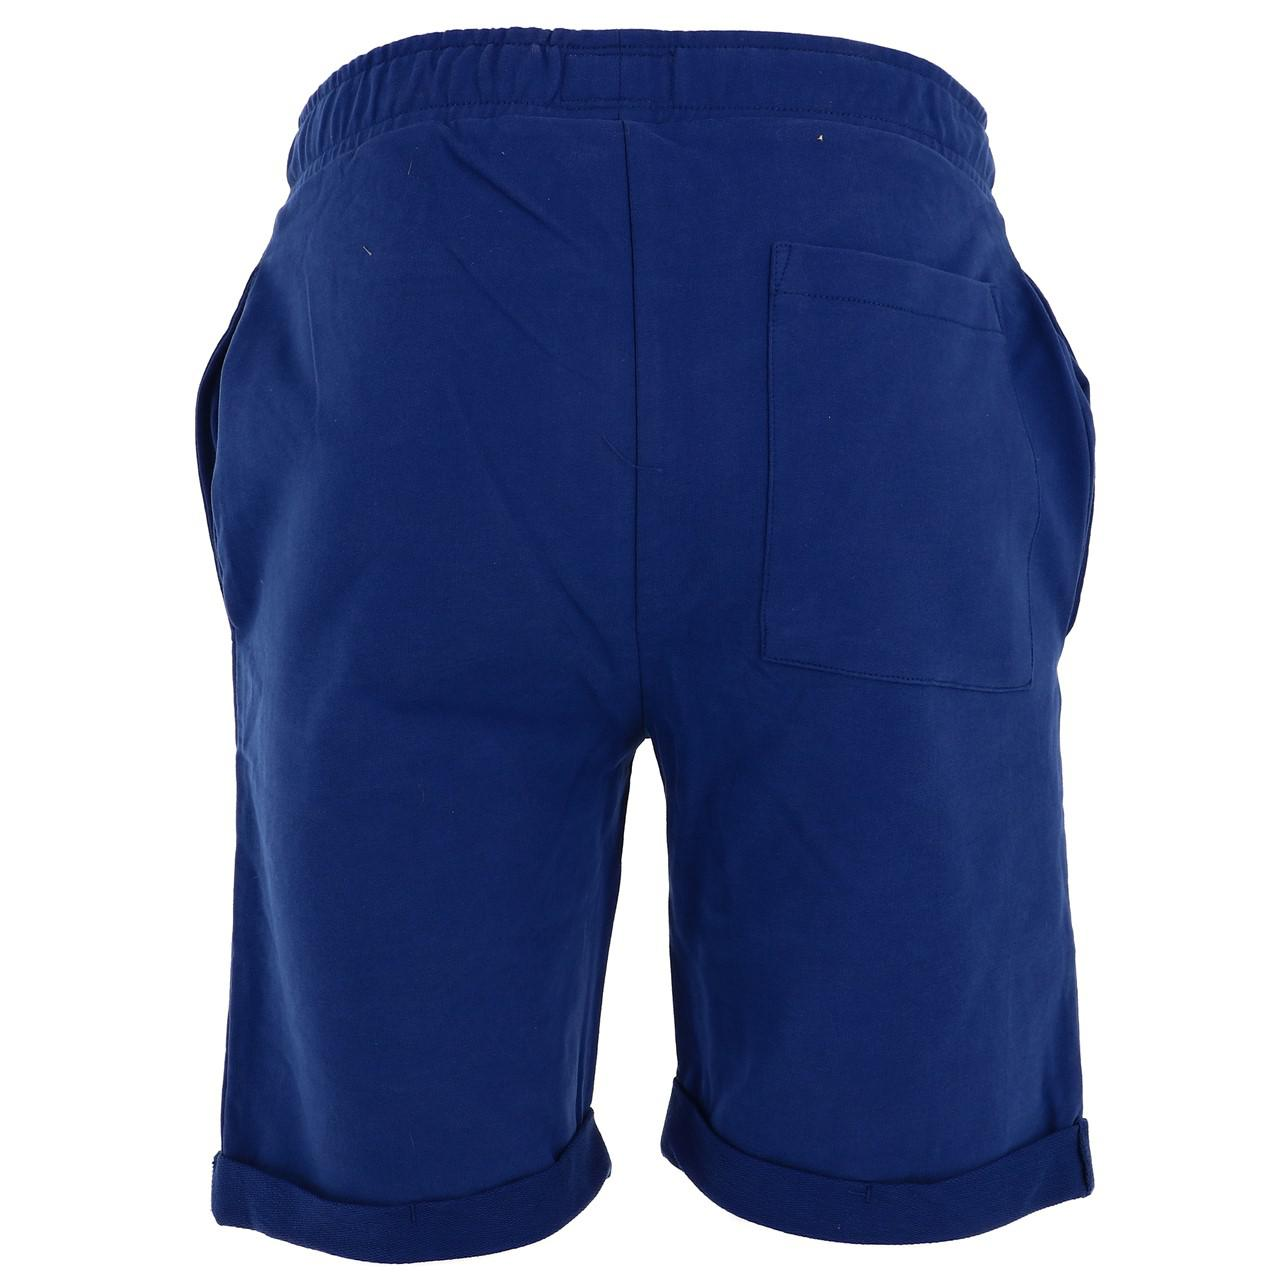 Bermuda-Shorts-Pepe-jeans-Otto-Navy-Shorts-Jr-Blue-17691-New thumbnail 5